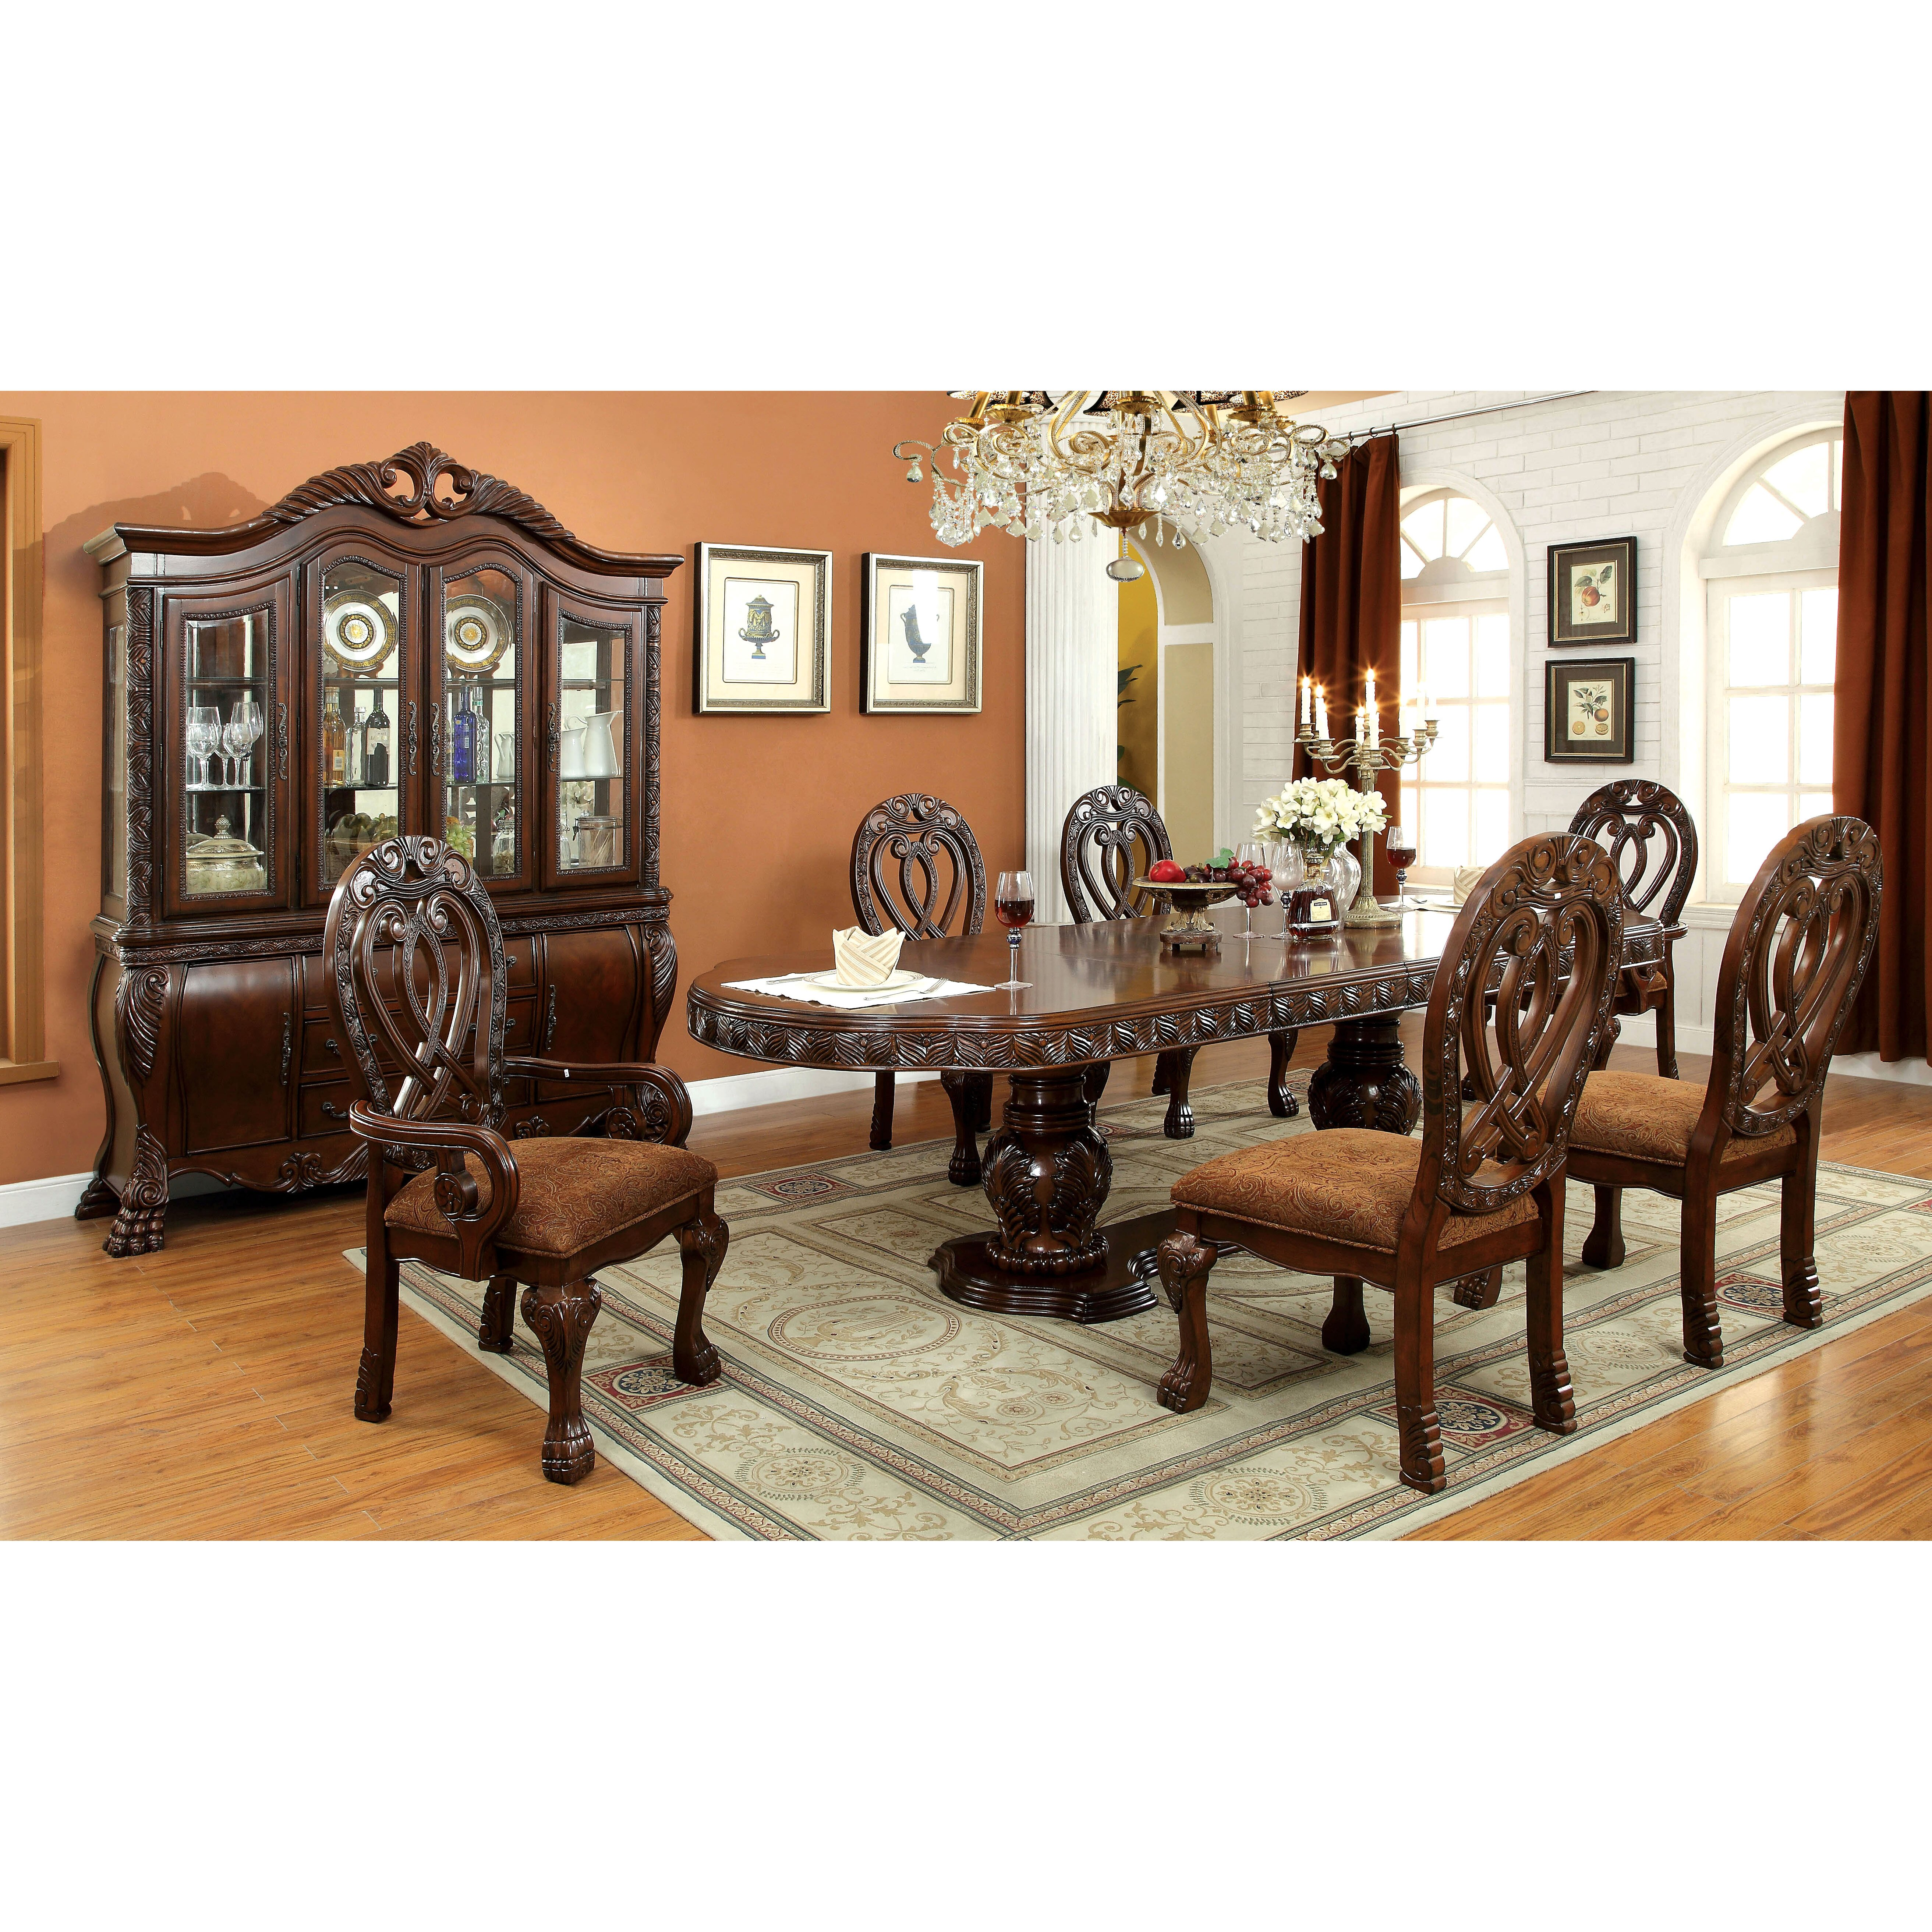 Hokku designs dolores 7 piece dining set reviews wayfair for Hokku designs dining room furniture